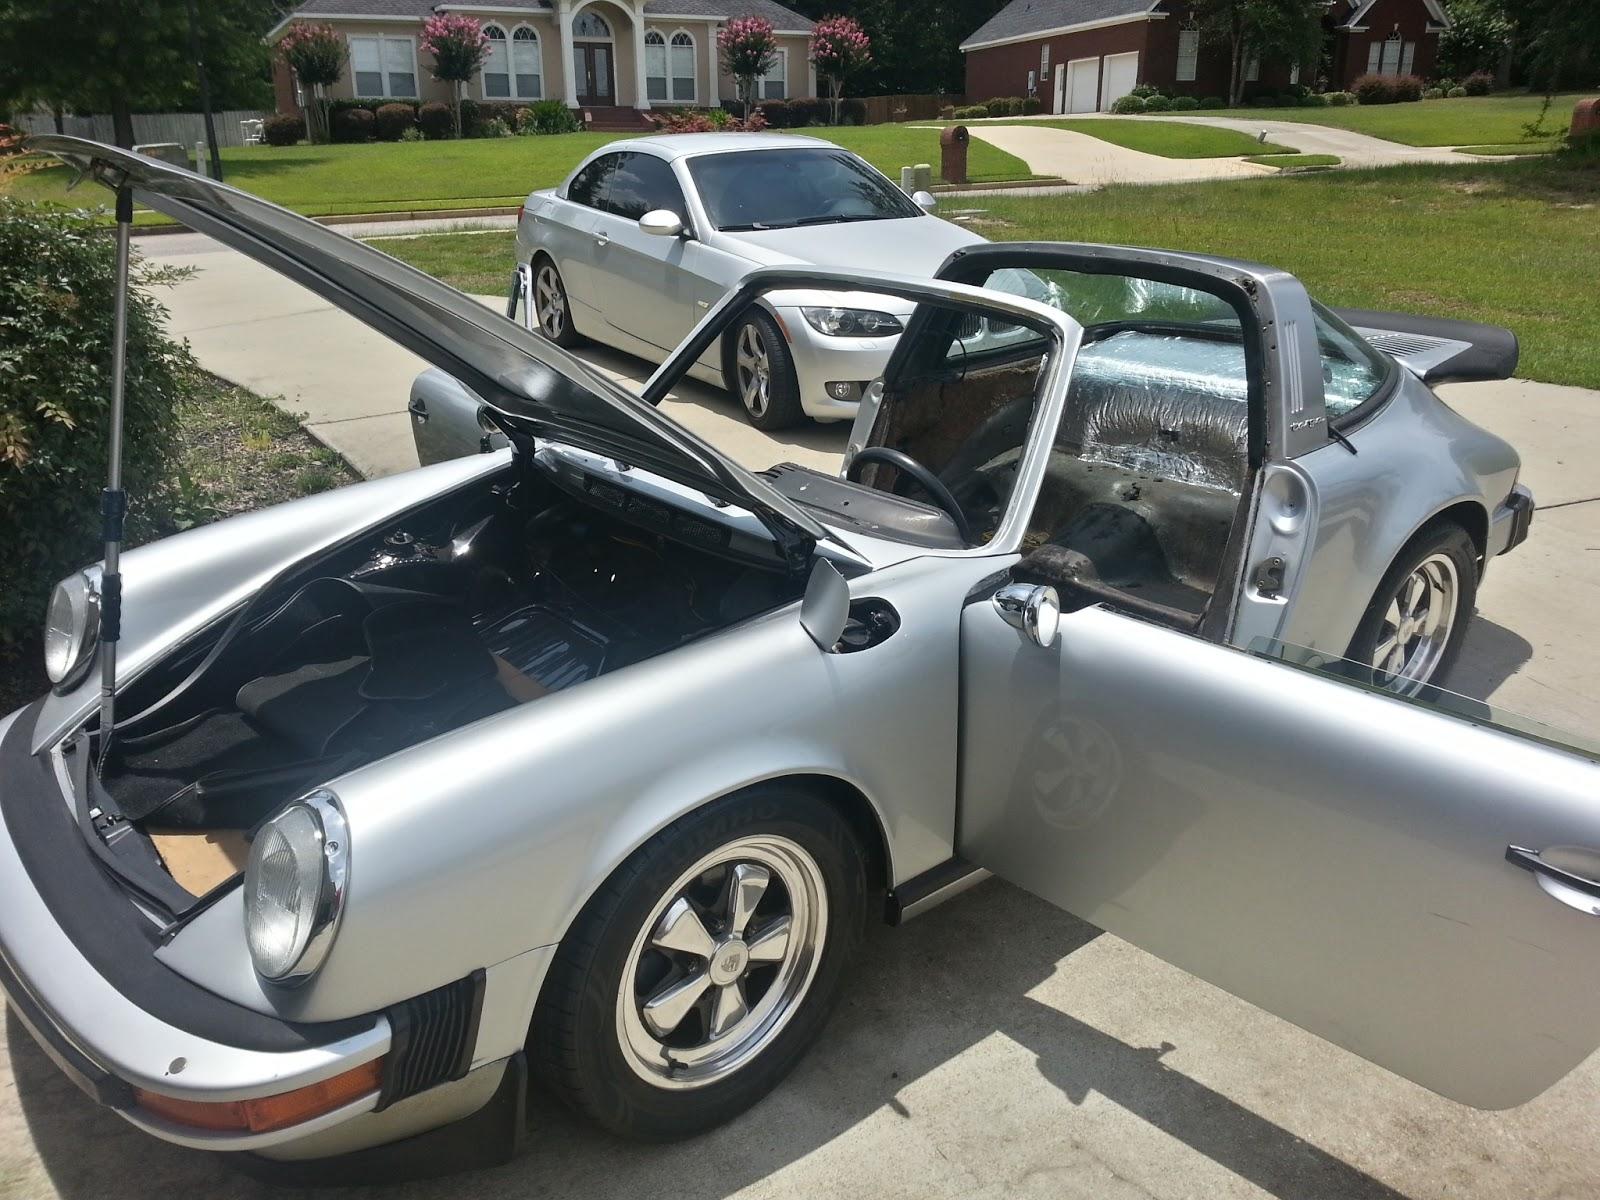 1975 Porsche 911 Targa Rebuild June 2013